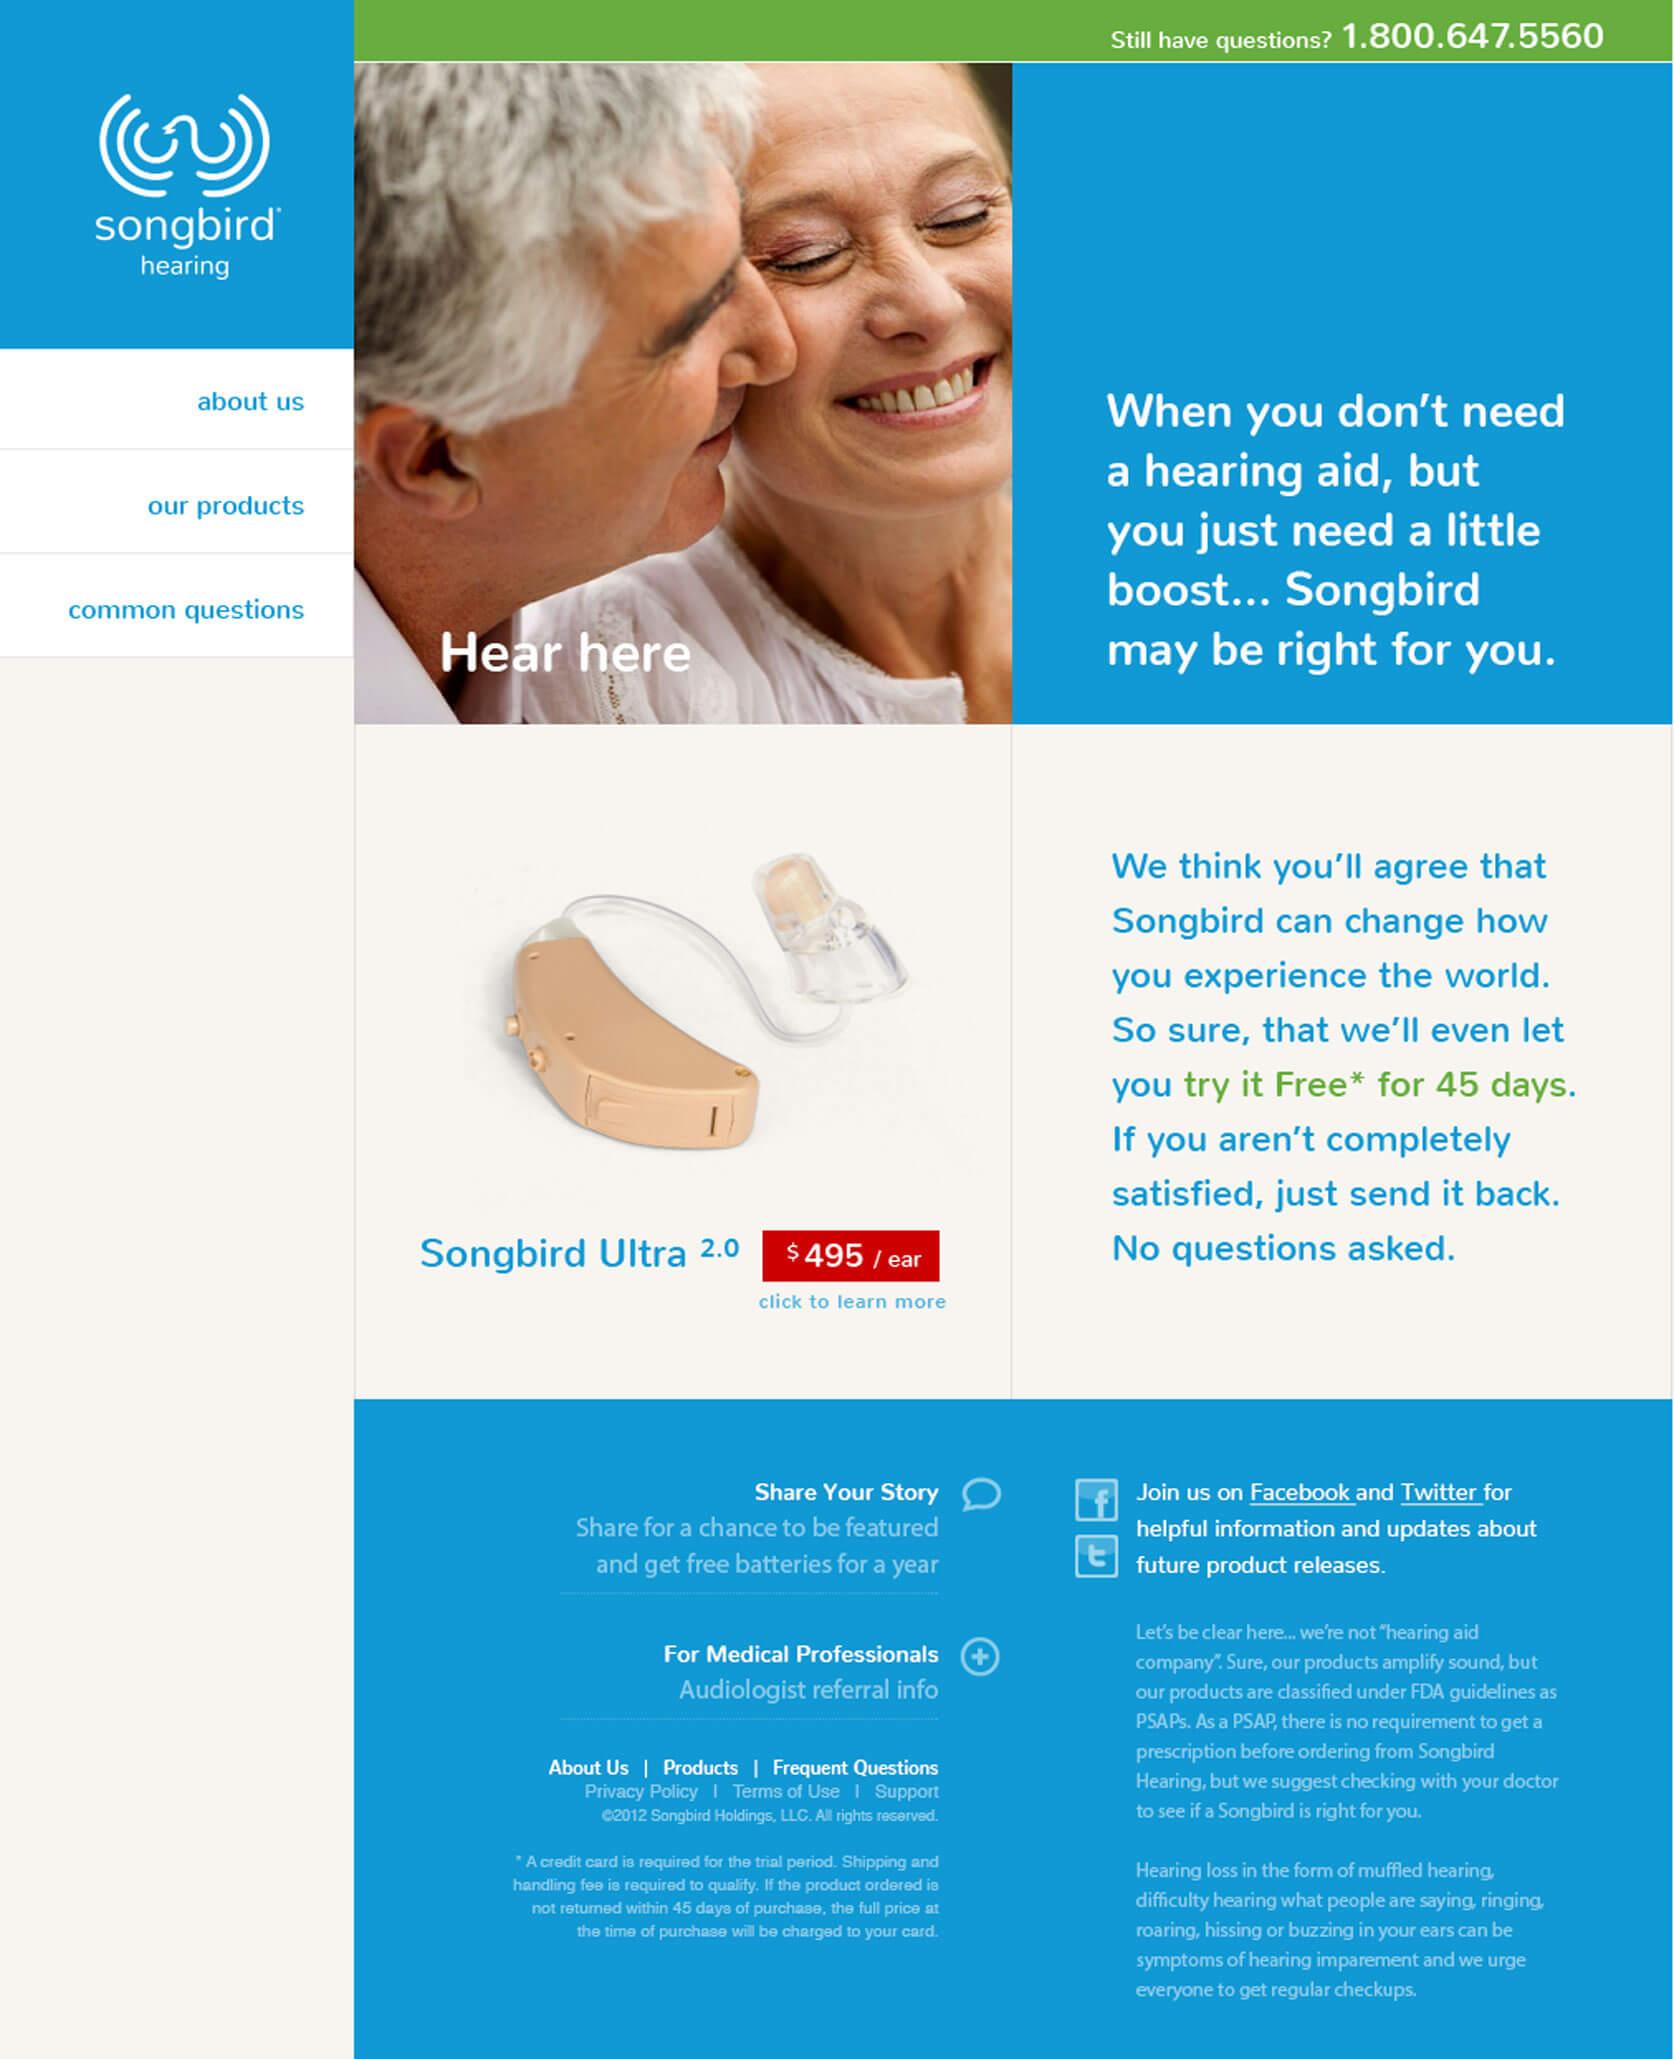 Songbird Hearing Website